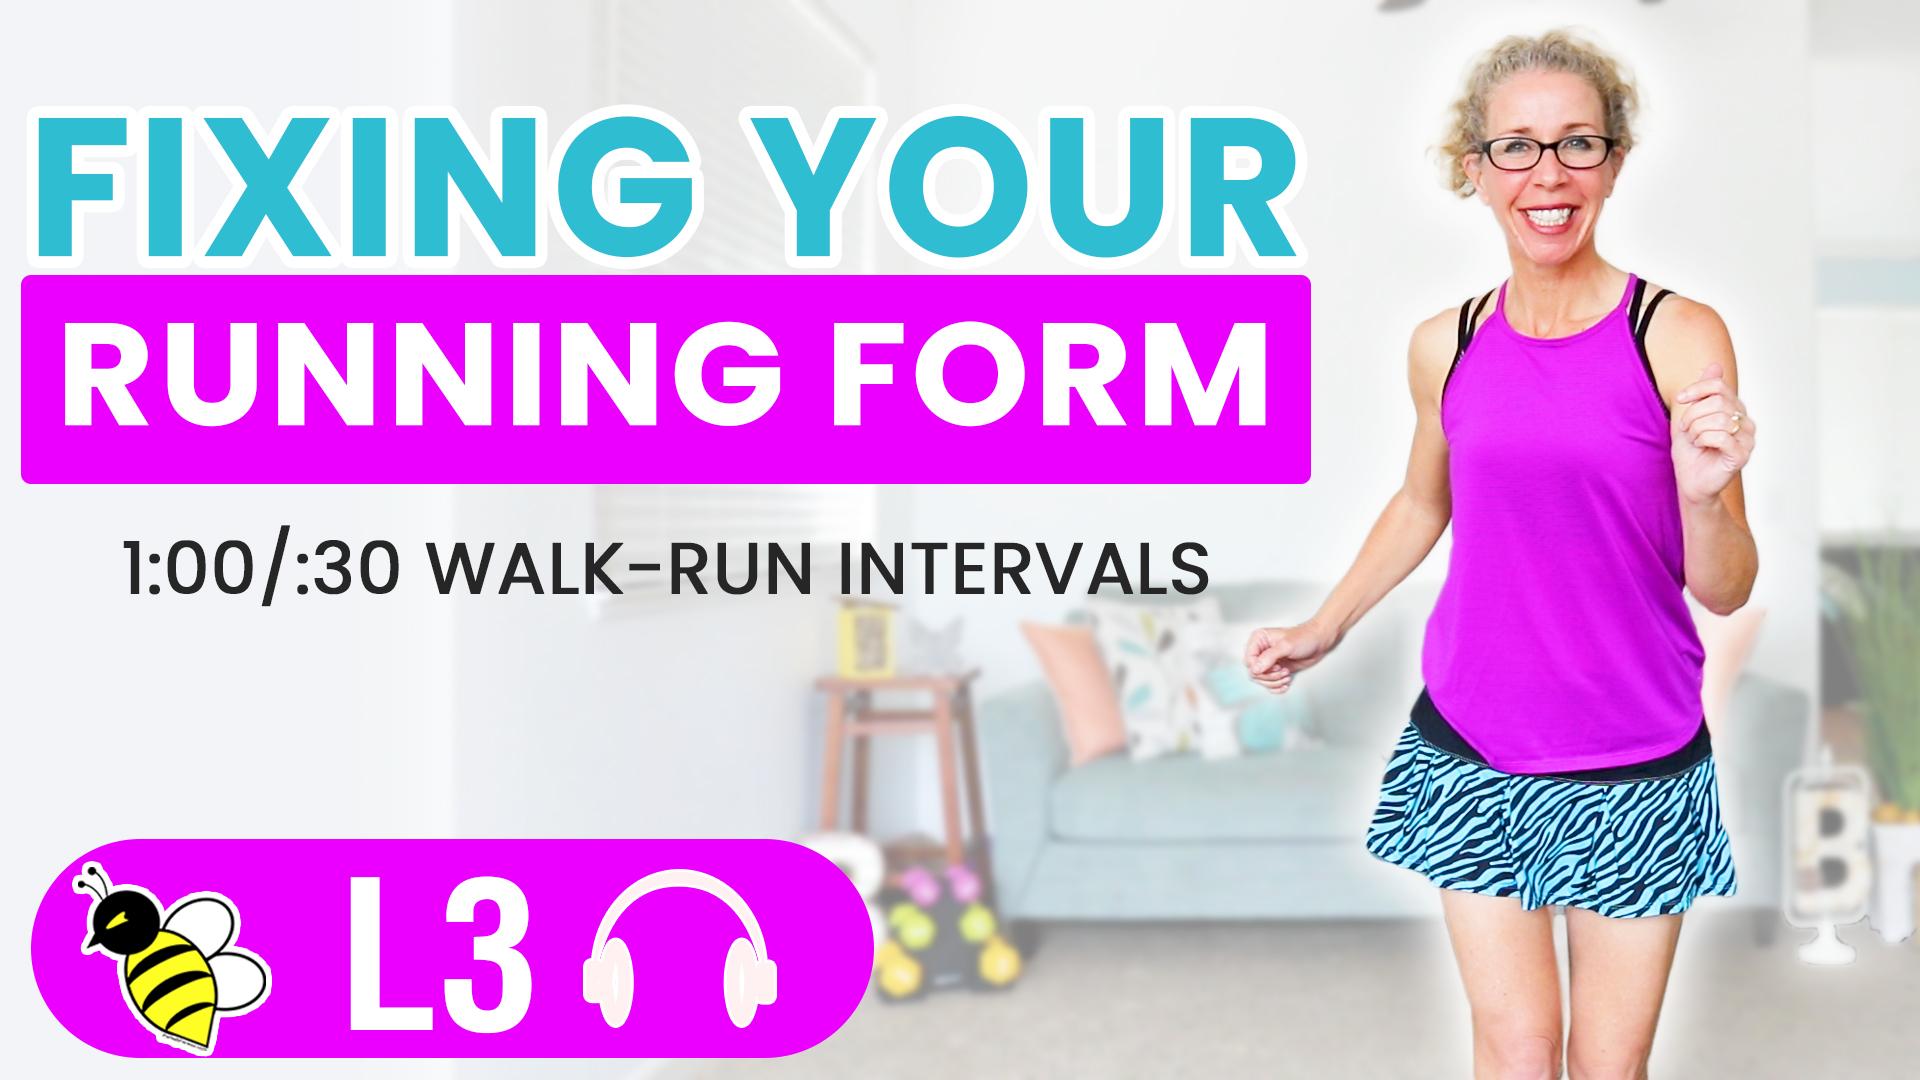 Fixing your RUNNING FORM 30 Minute WALK + RUN